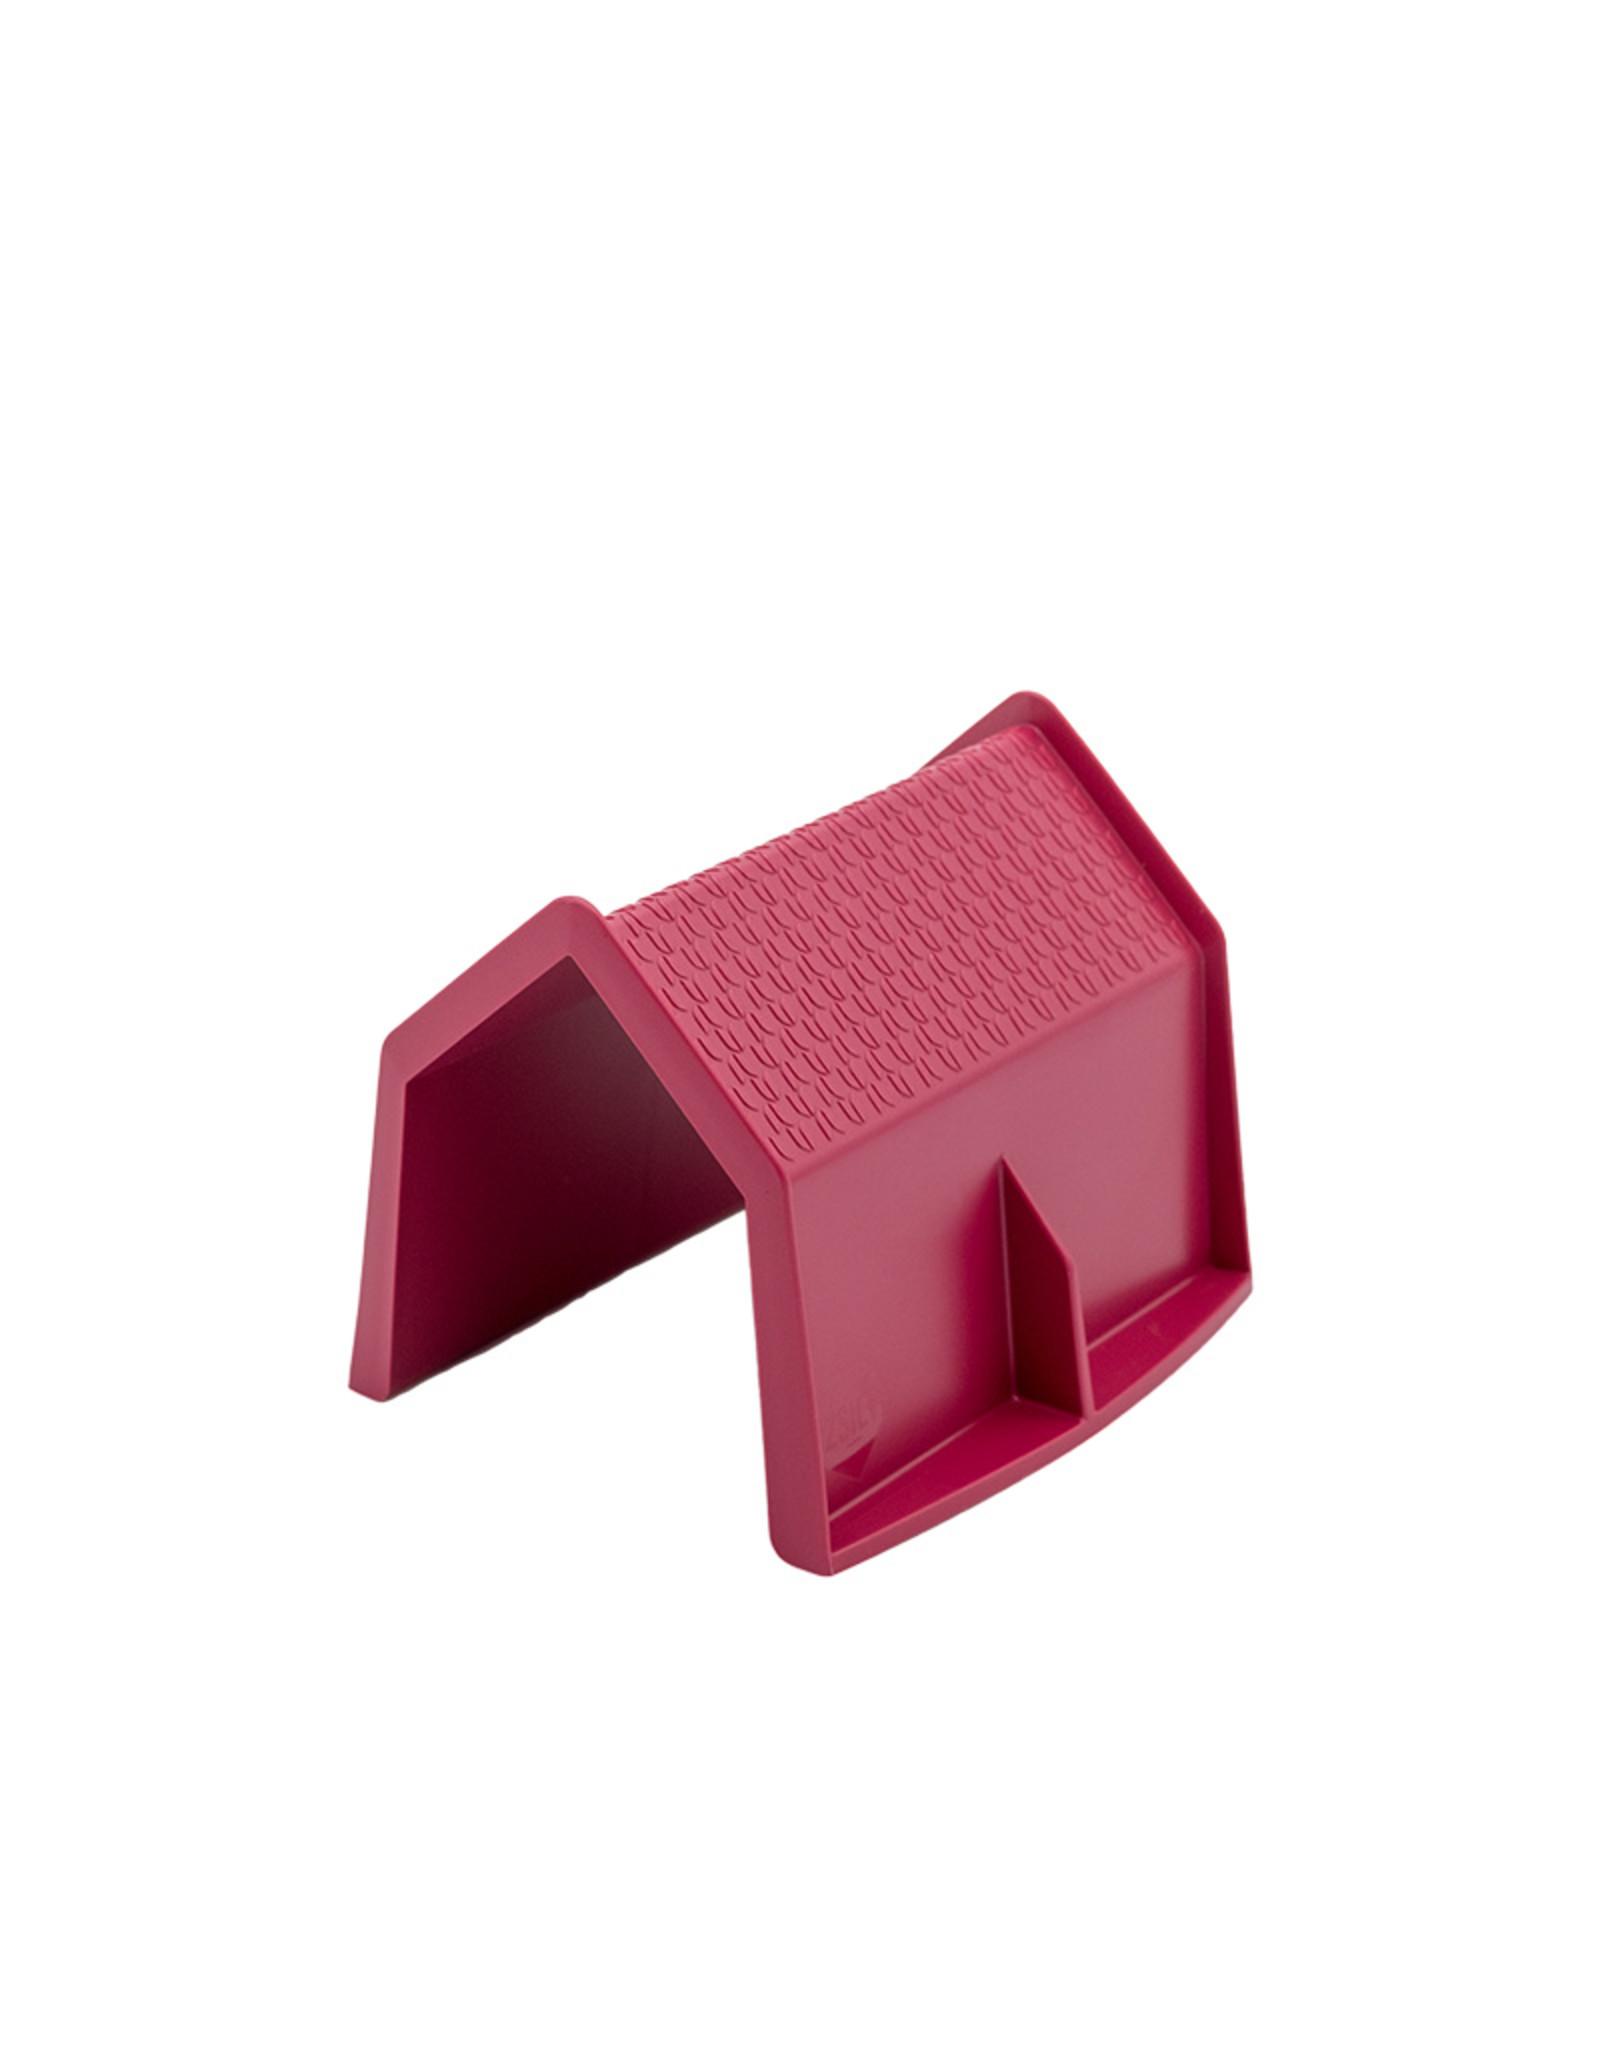 Zsilt House Red